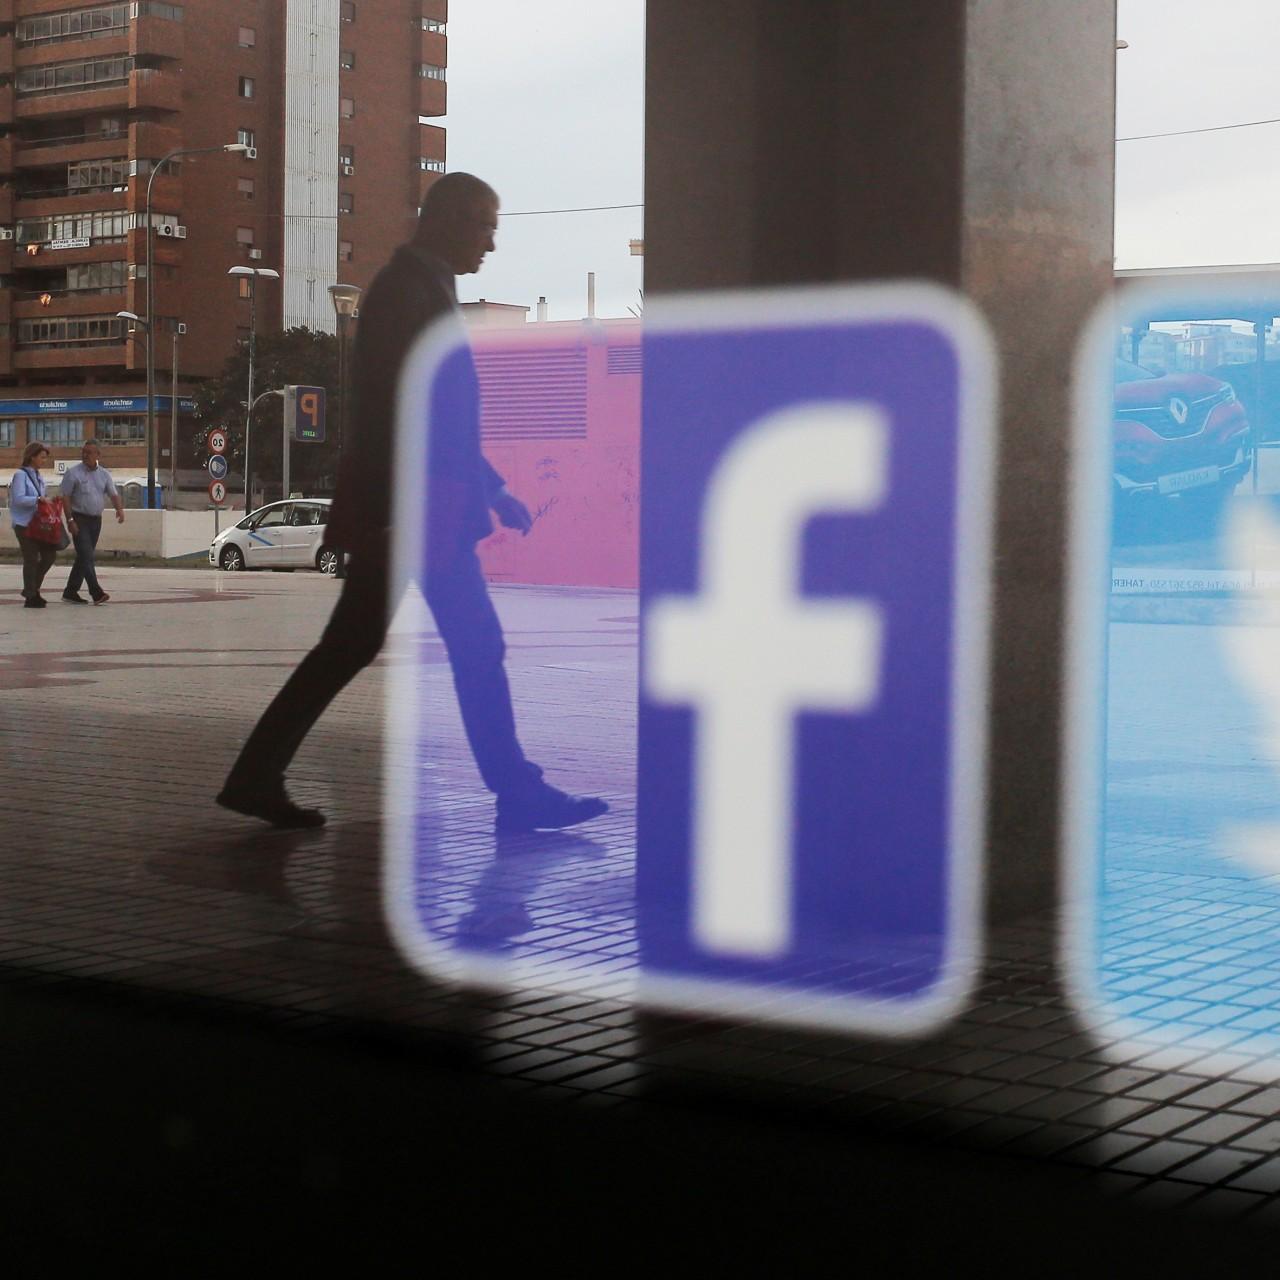 QQ? Weibo? Youku? US visa applicants told to list social media